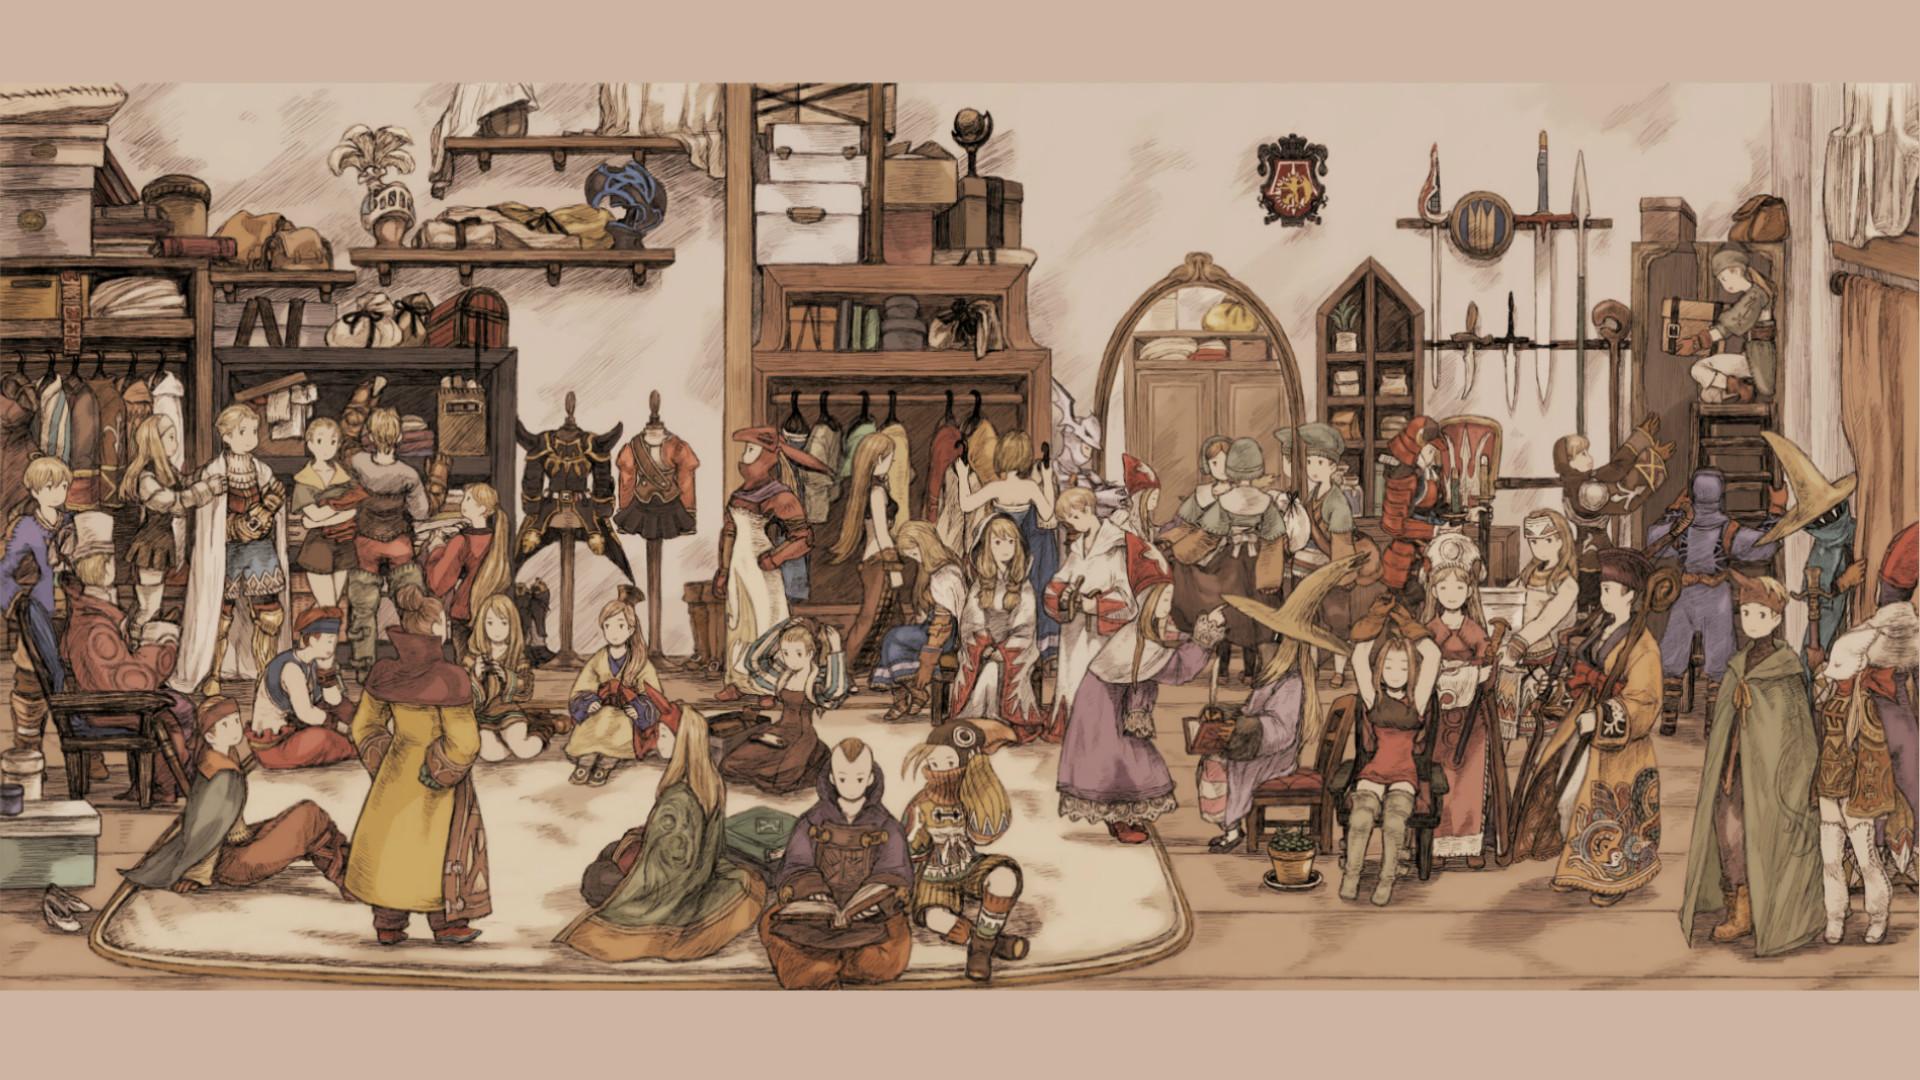 Anime Final Fantasy Tactics Final Fantasy Delita Ramza Agrias Job  System White Mage Black Mage